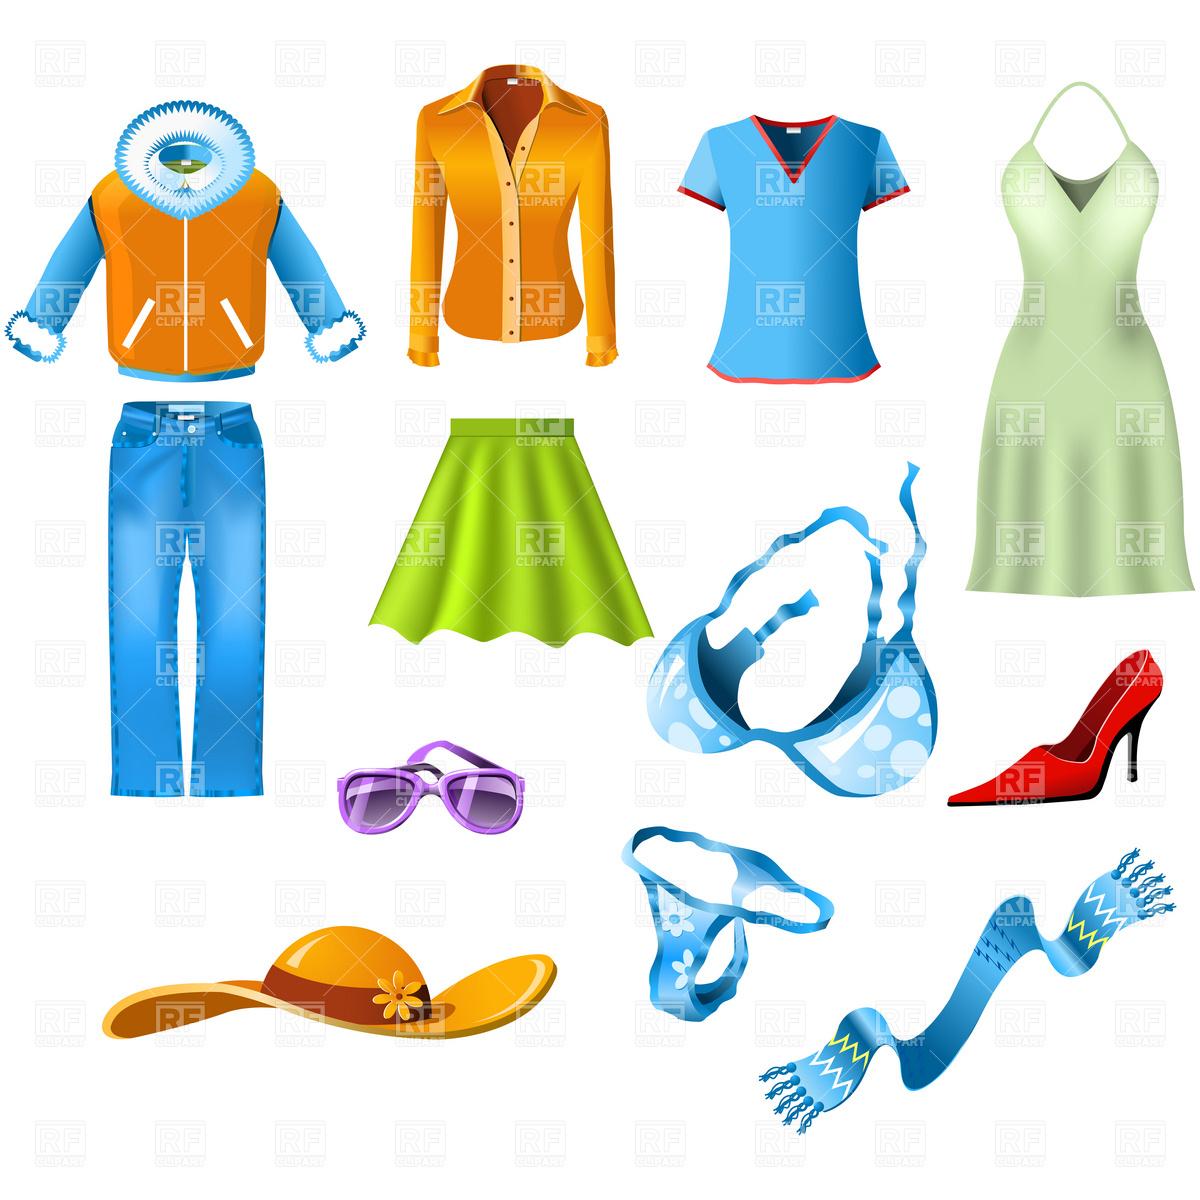 Fashion kid clipartix . Clothes clipart women's clothing